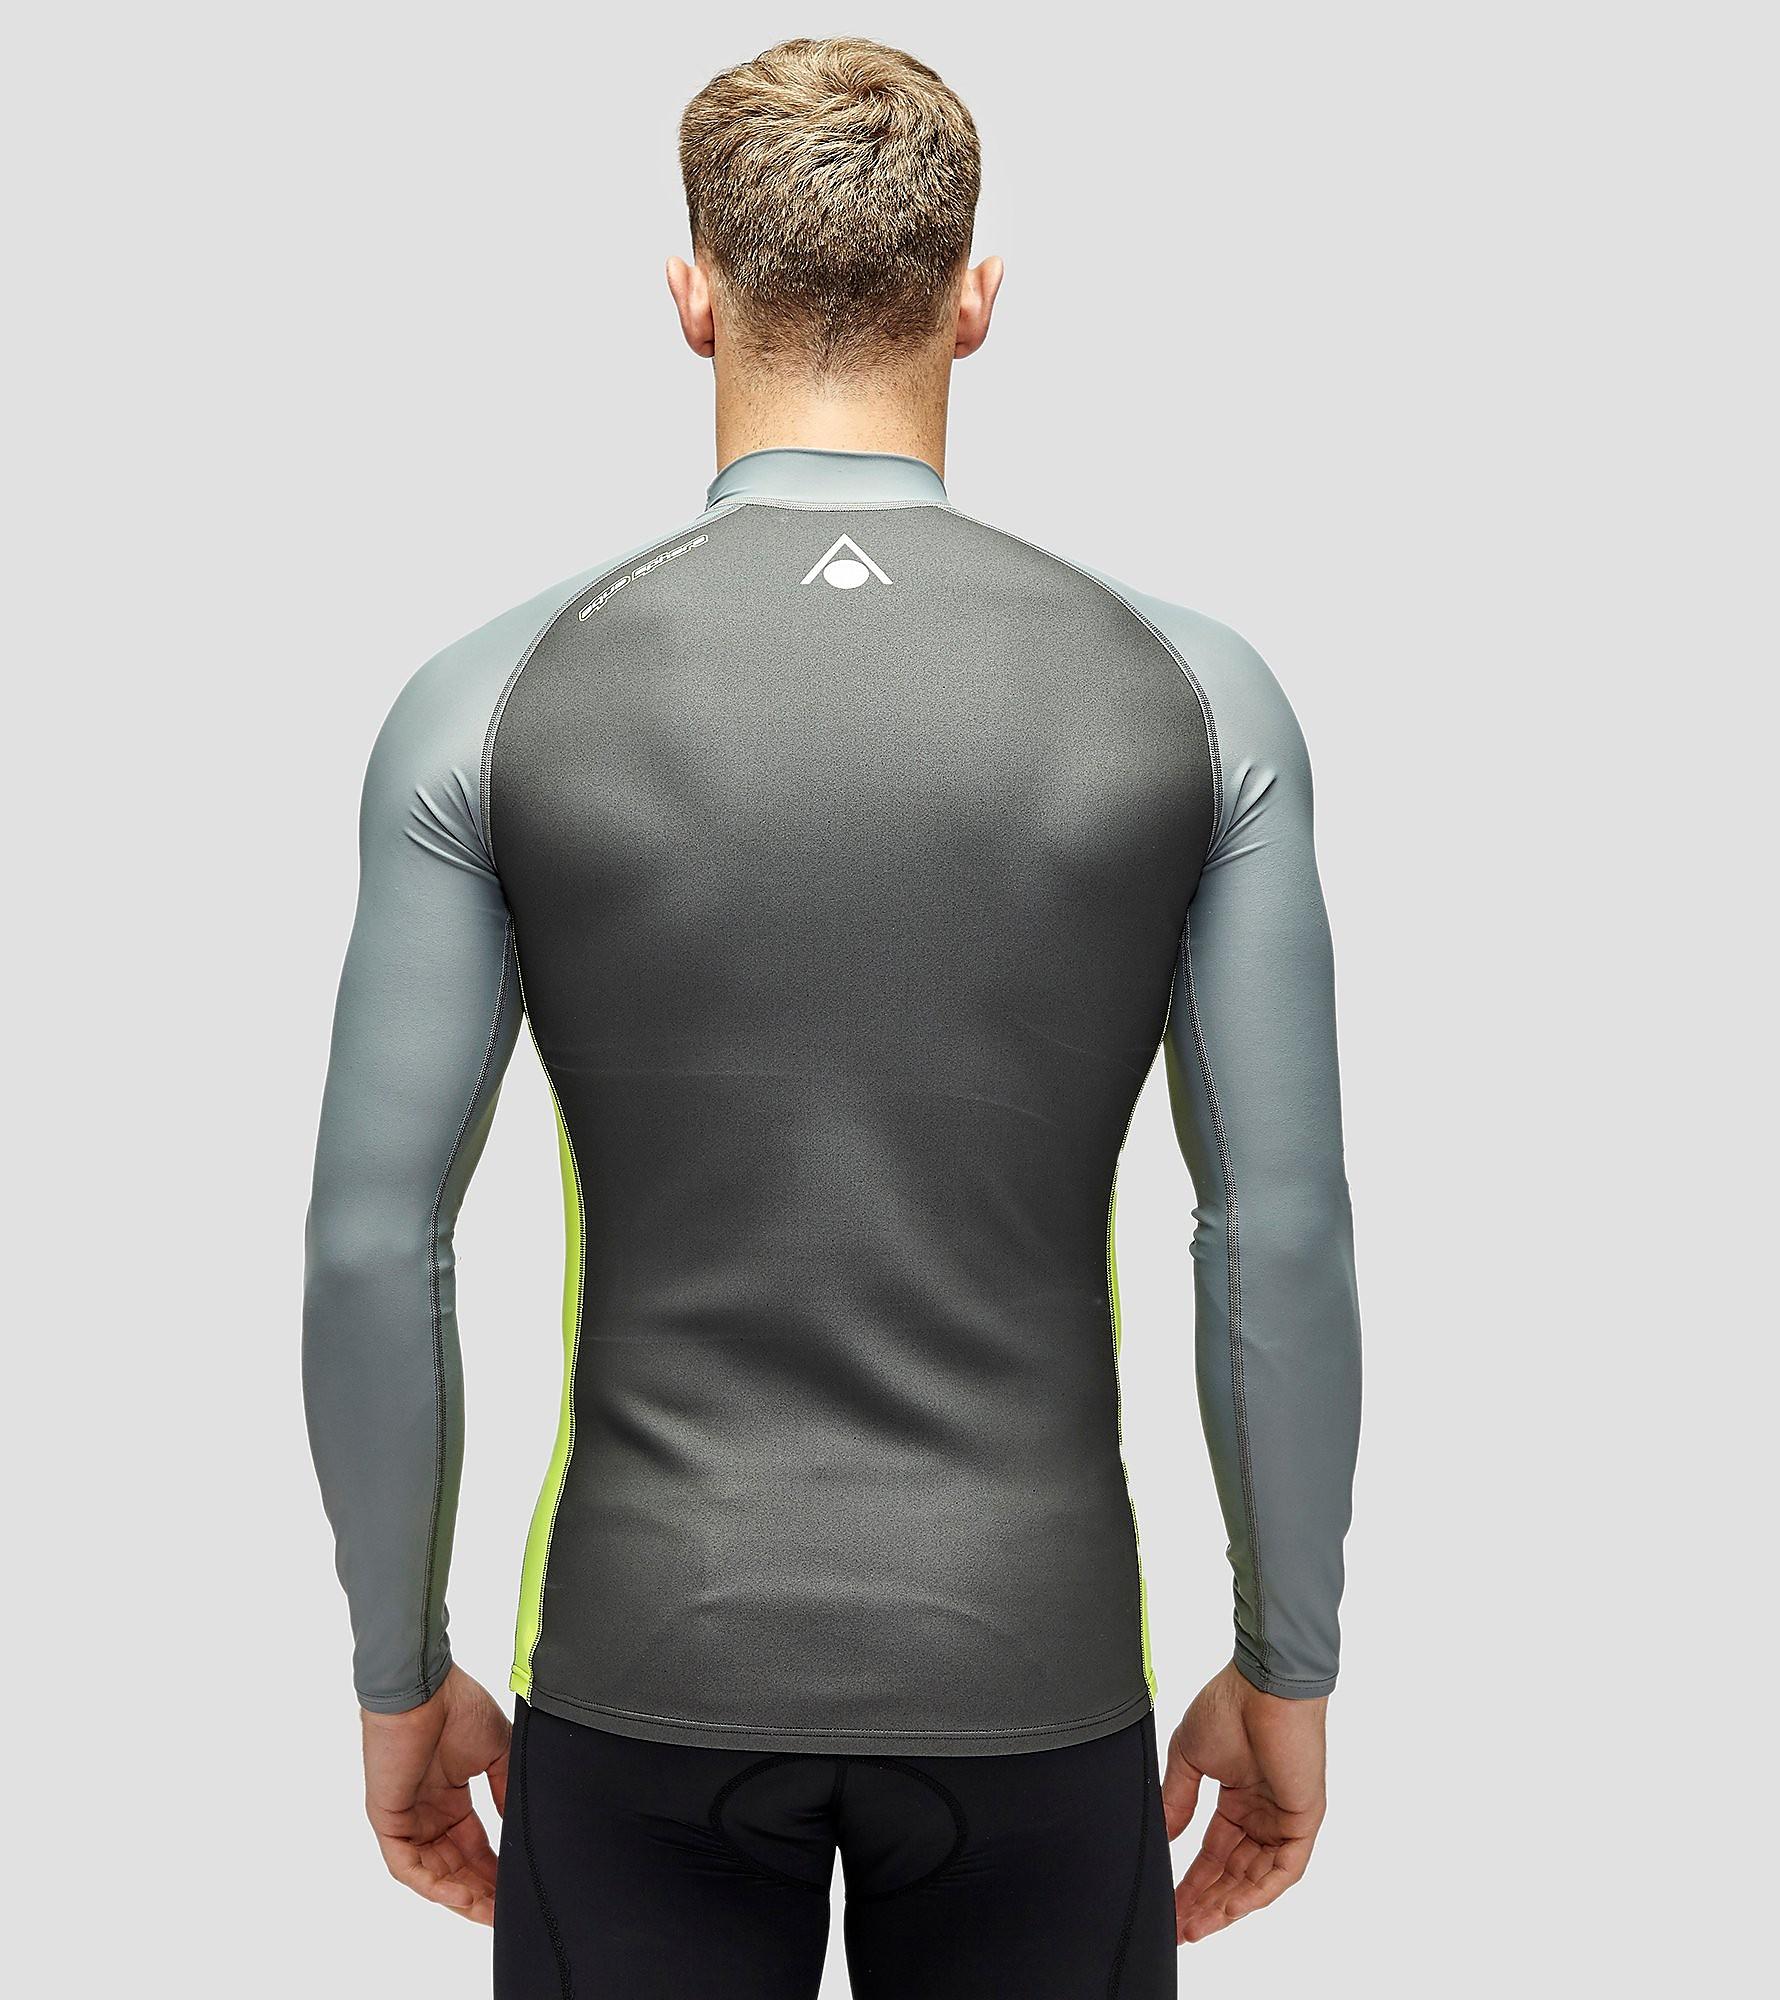 Aqua Sphere Aqua Skin Long Sleeve Rashguard